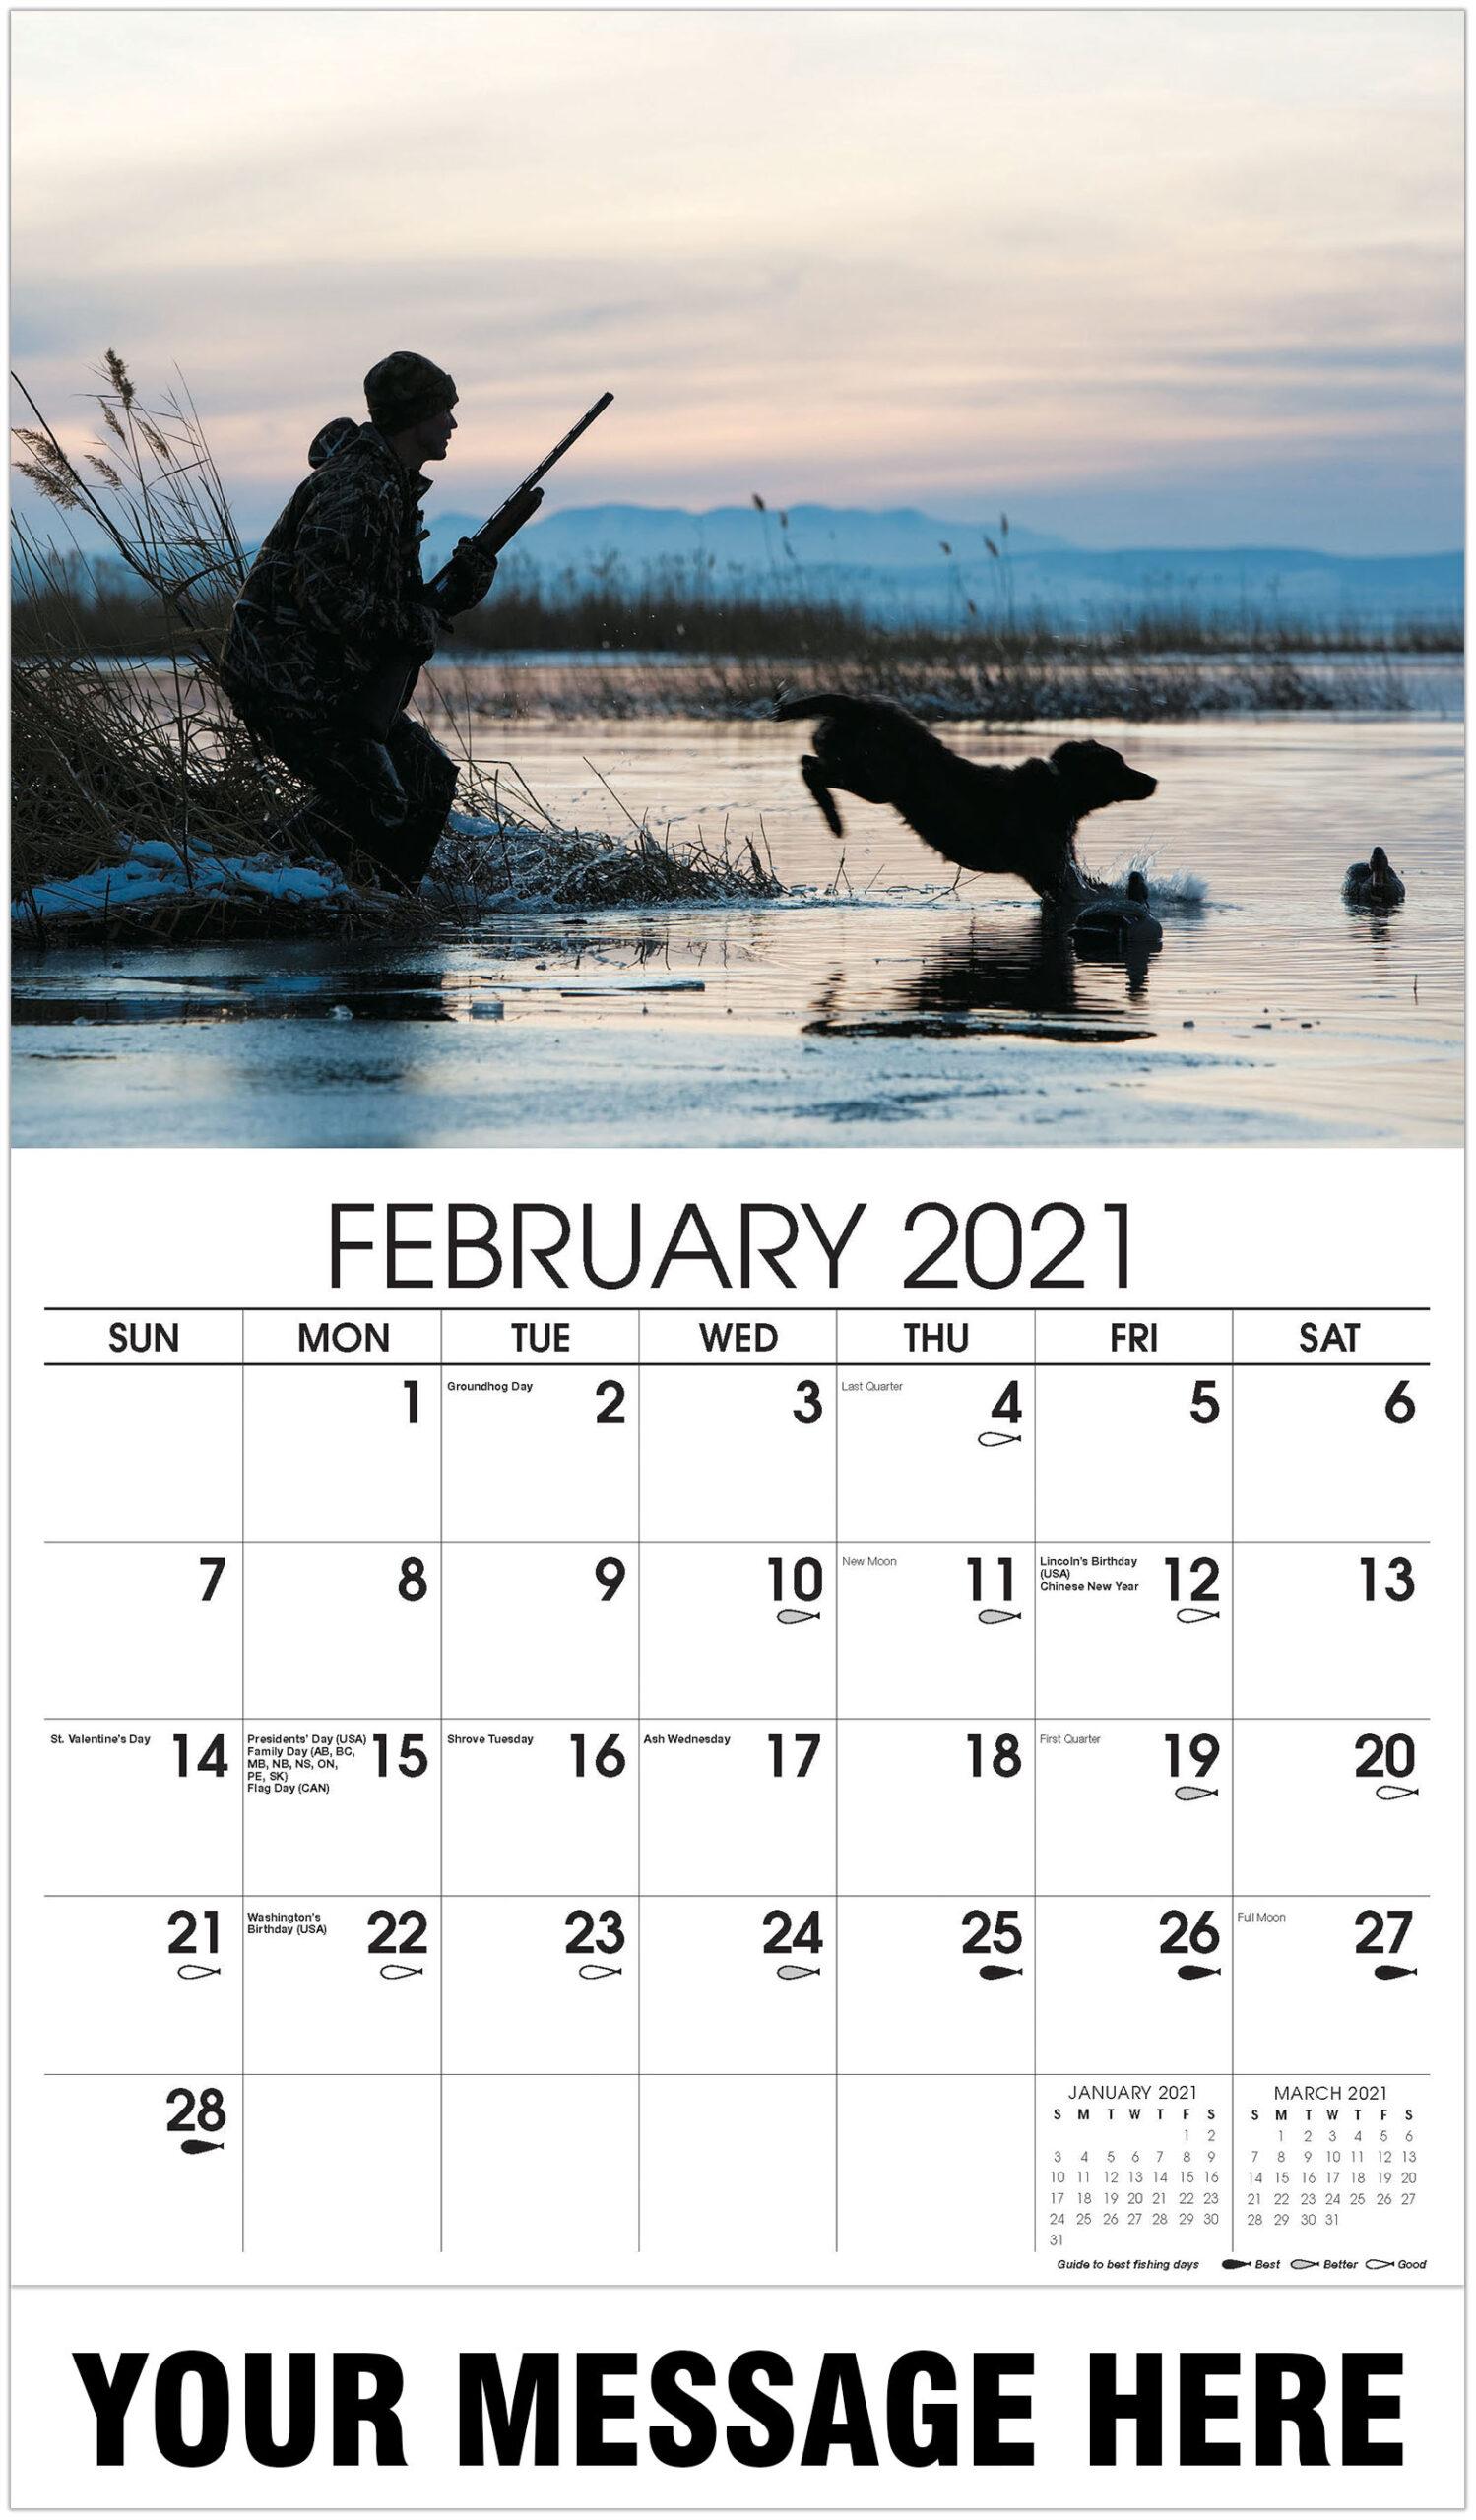 Fishing & Hunting for Hunting Calendar 2021